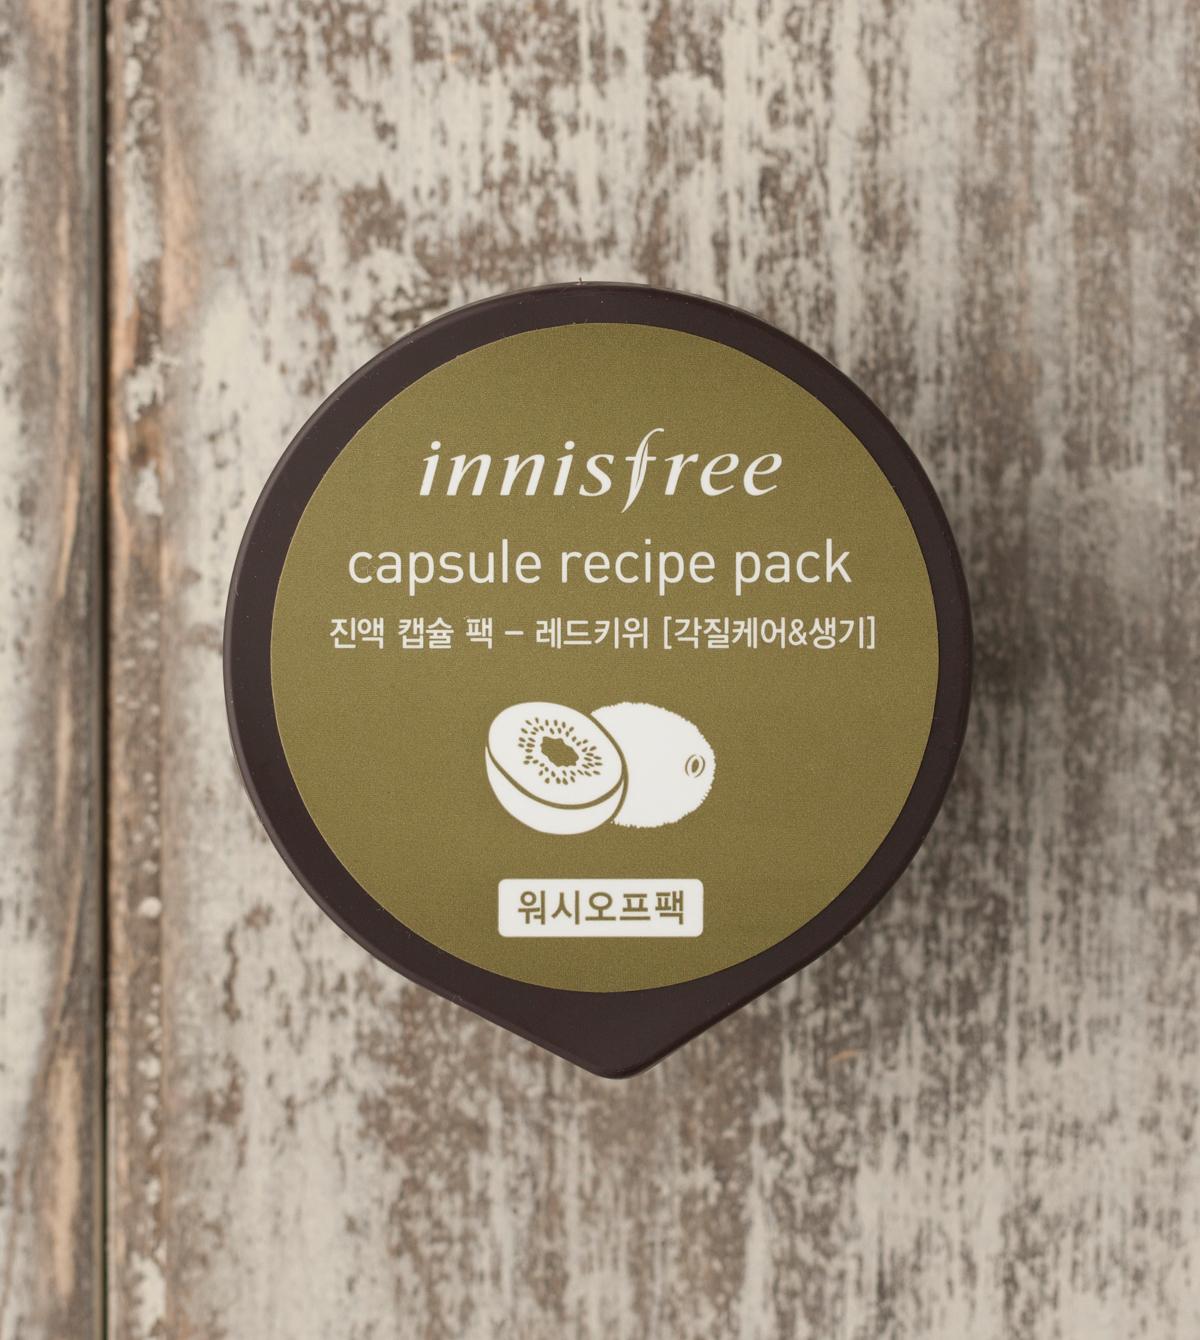 INNISFREE CAPSULE RECIPE PACK-RED KIWI